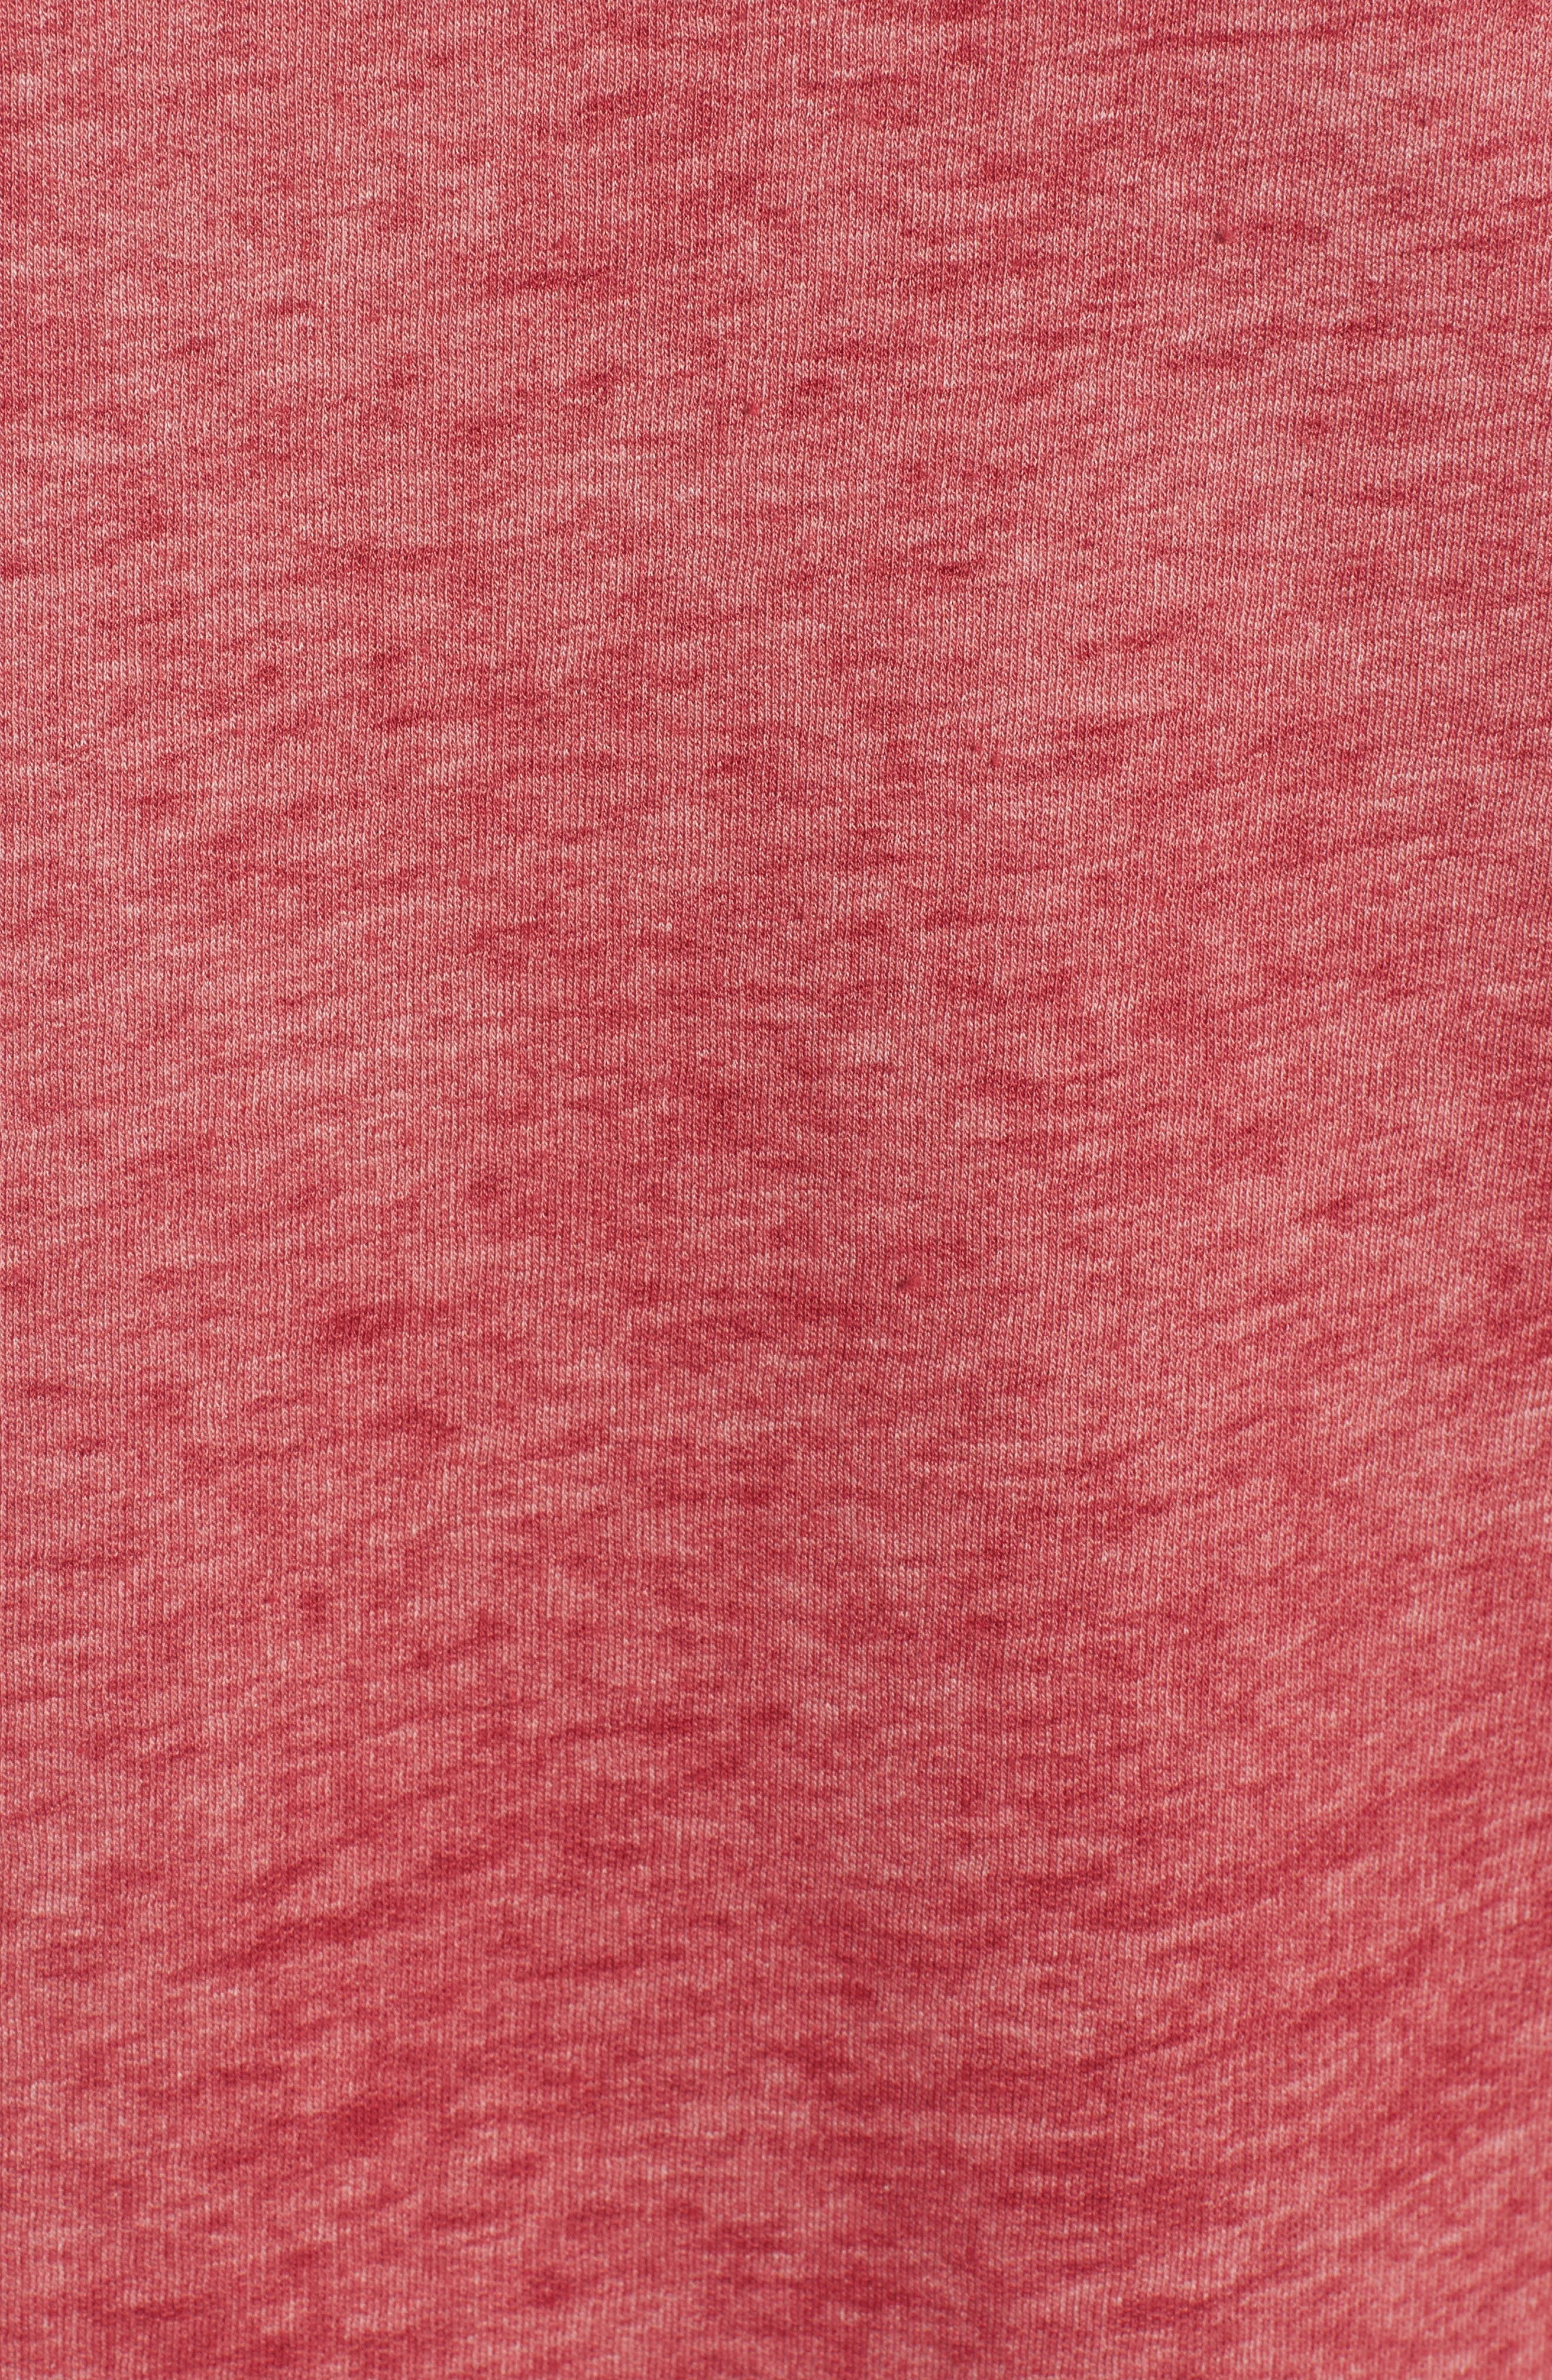 Bell Sleeve Sweatshirt,                             Alternate thumbnail 22, color,